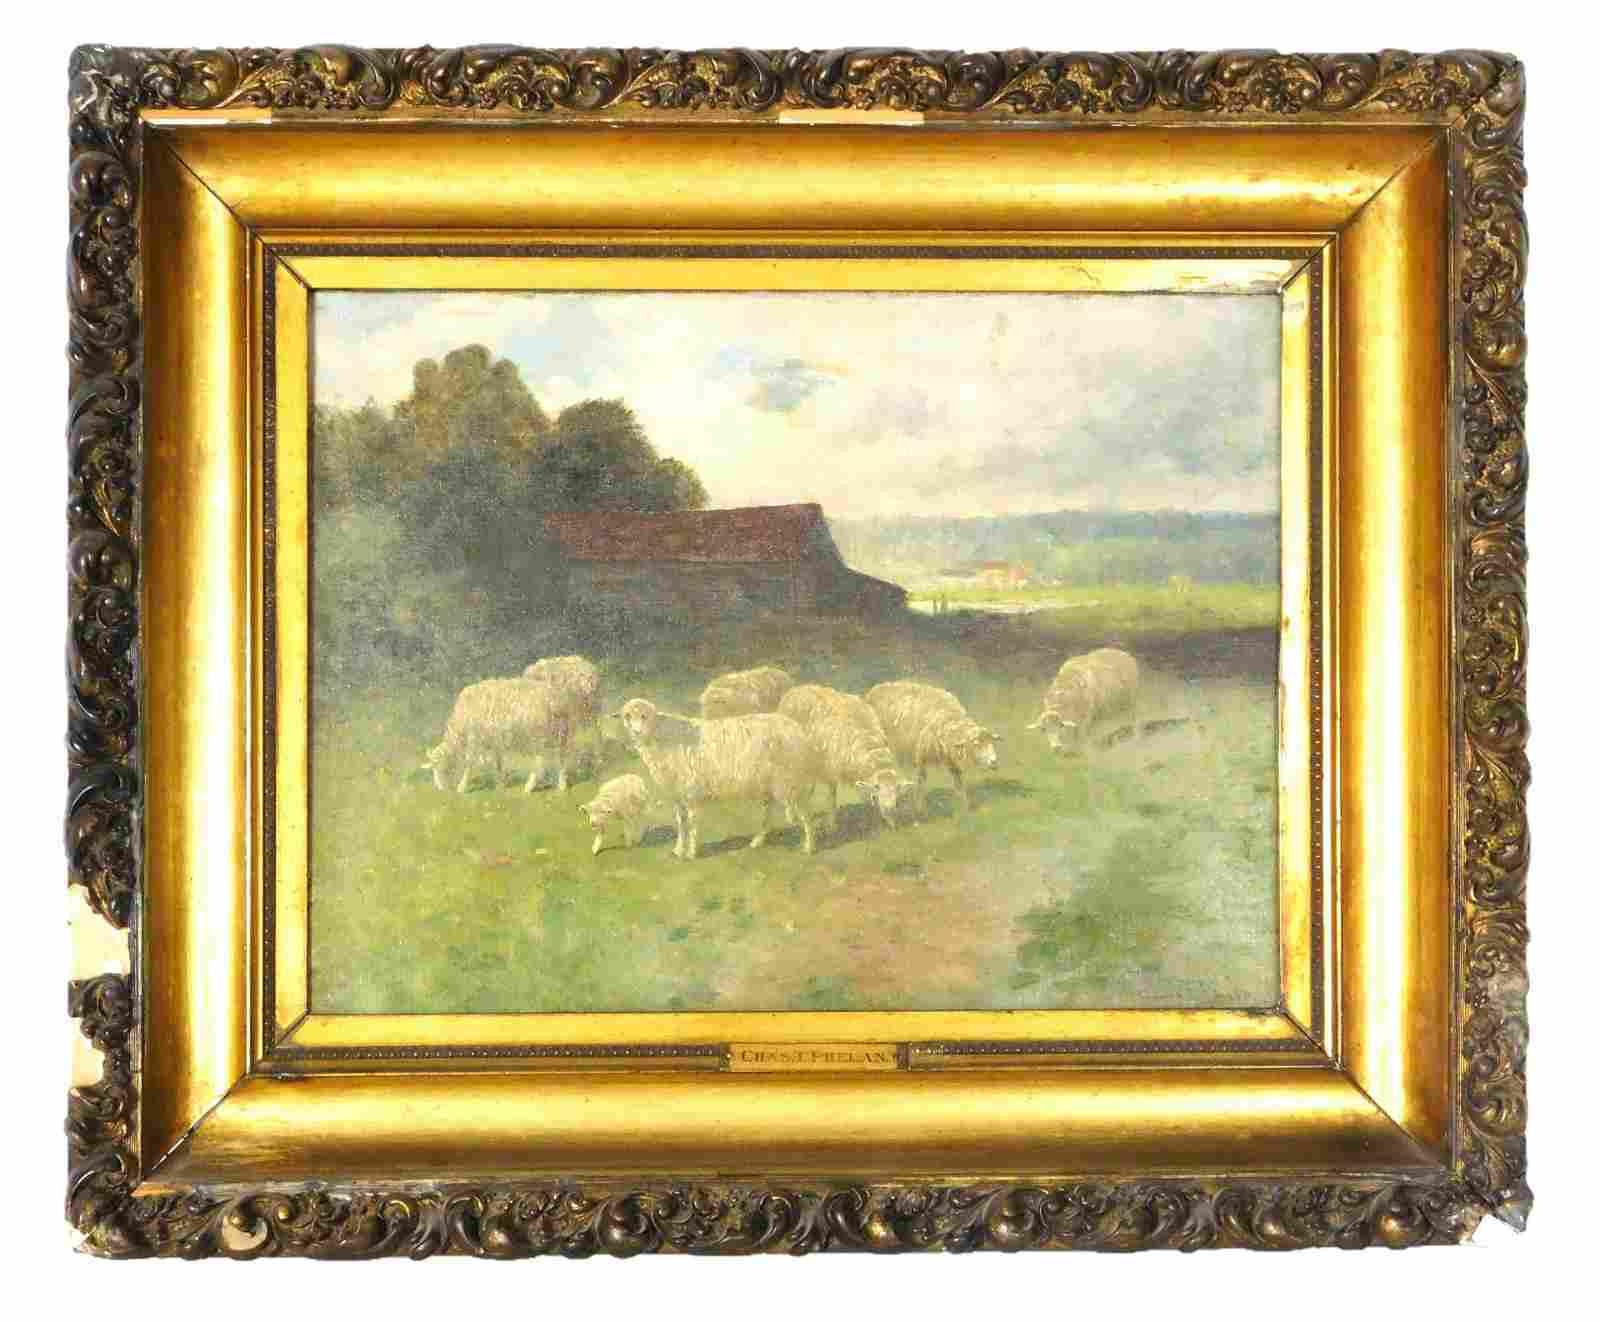 Charles T. Phelan (b. 1840, New York), oil on canvas,